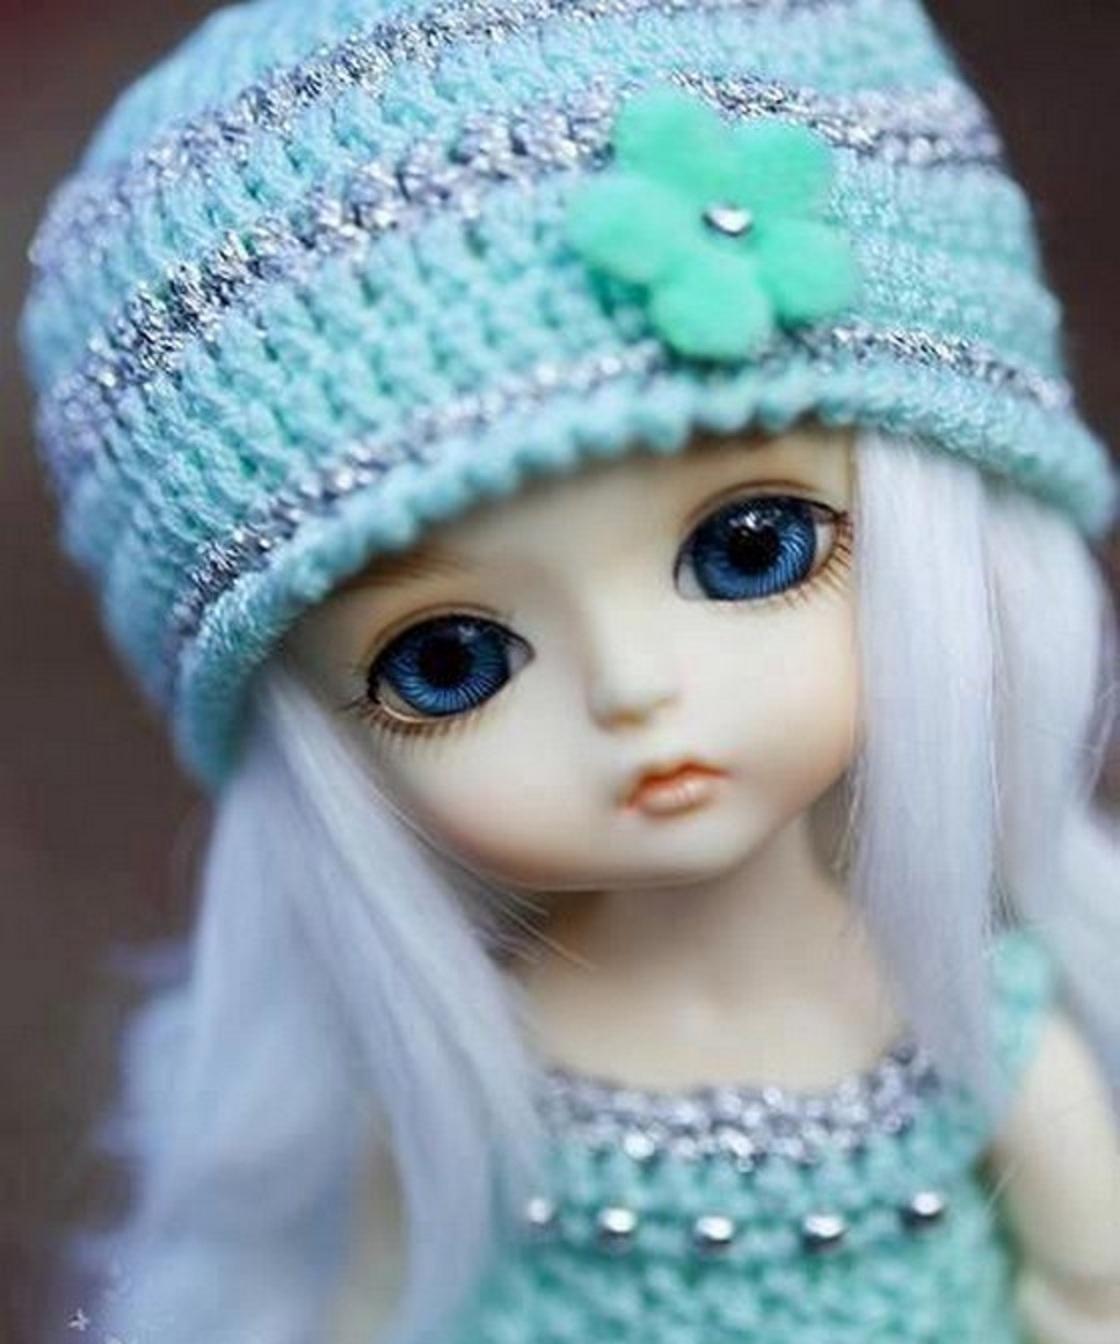 Barbie Wallpaper Hd 3d: Cute Baby Barbie Doll Wallpaper